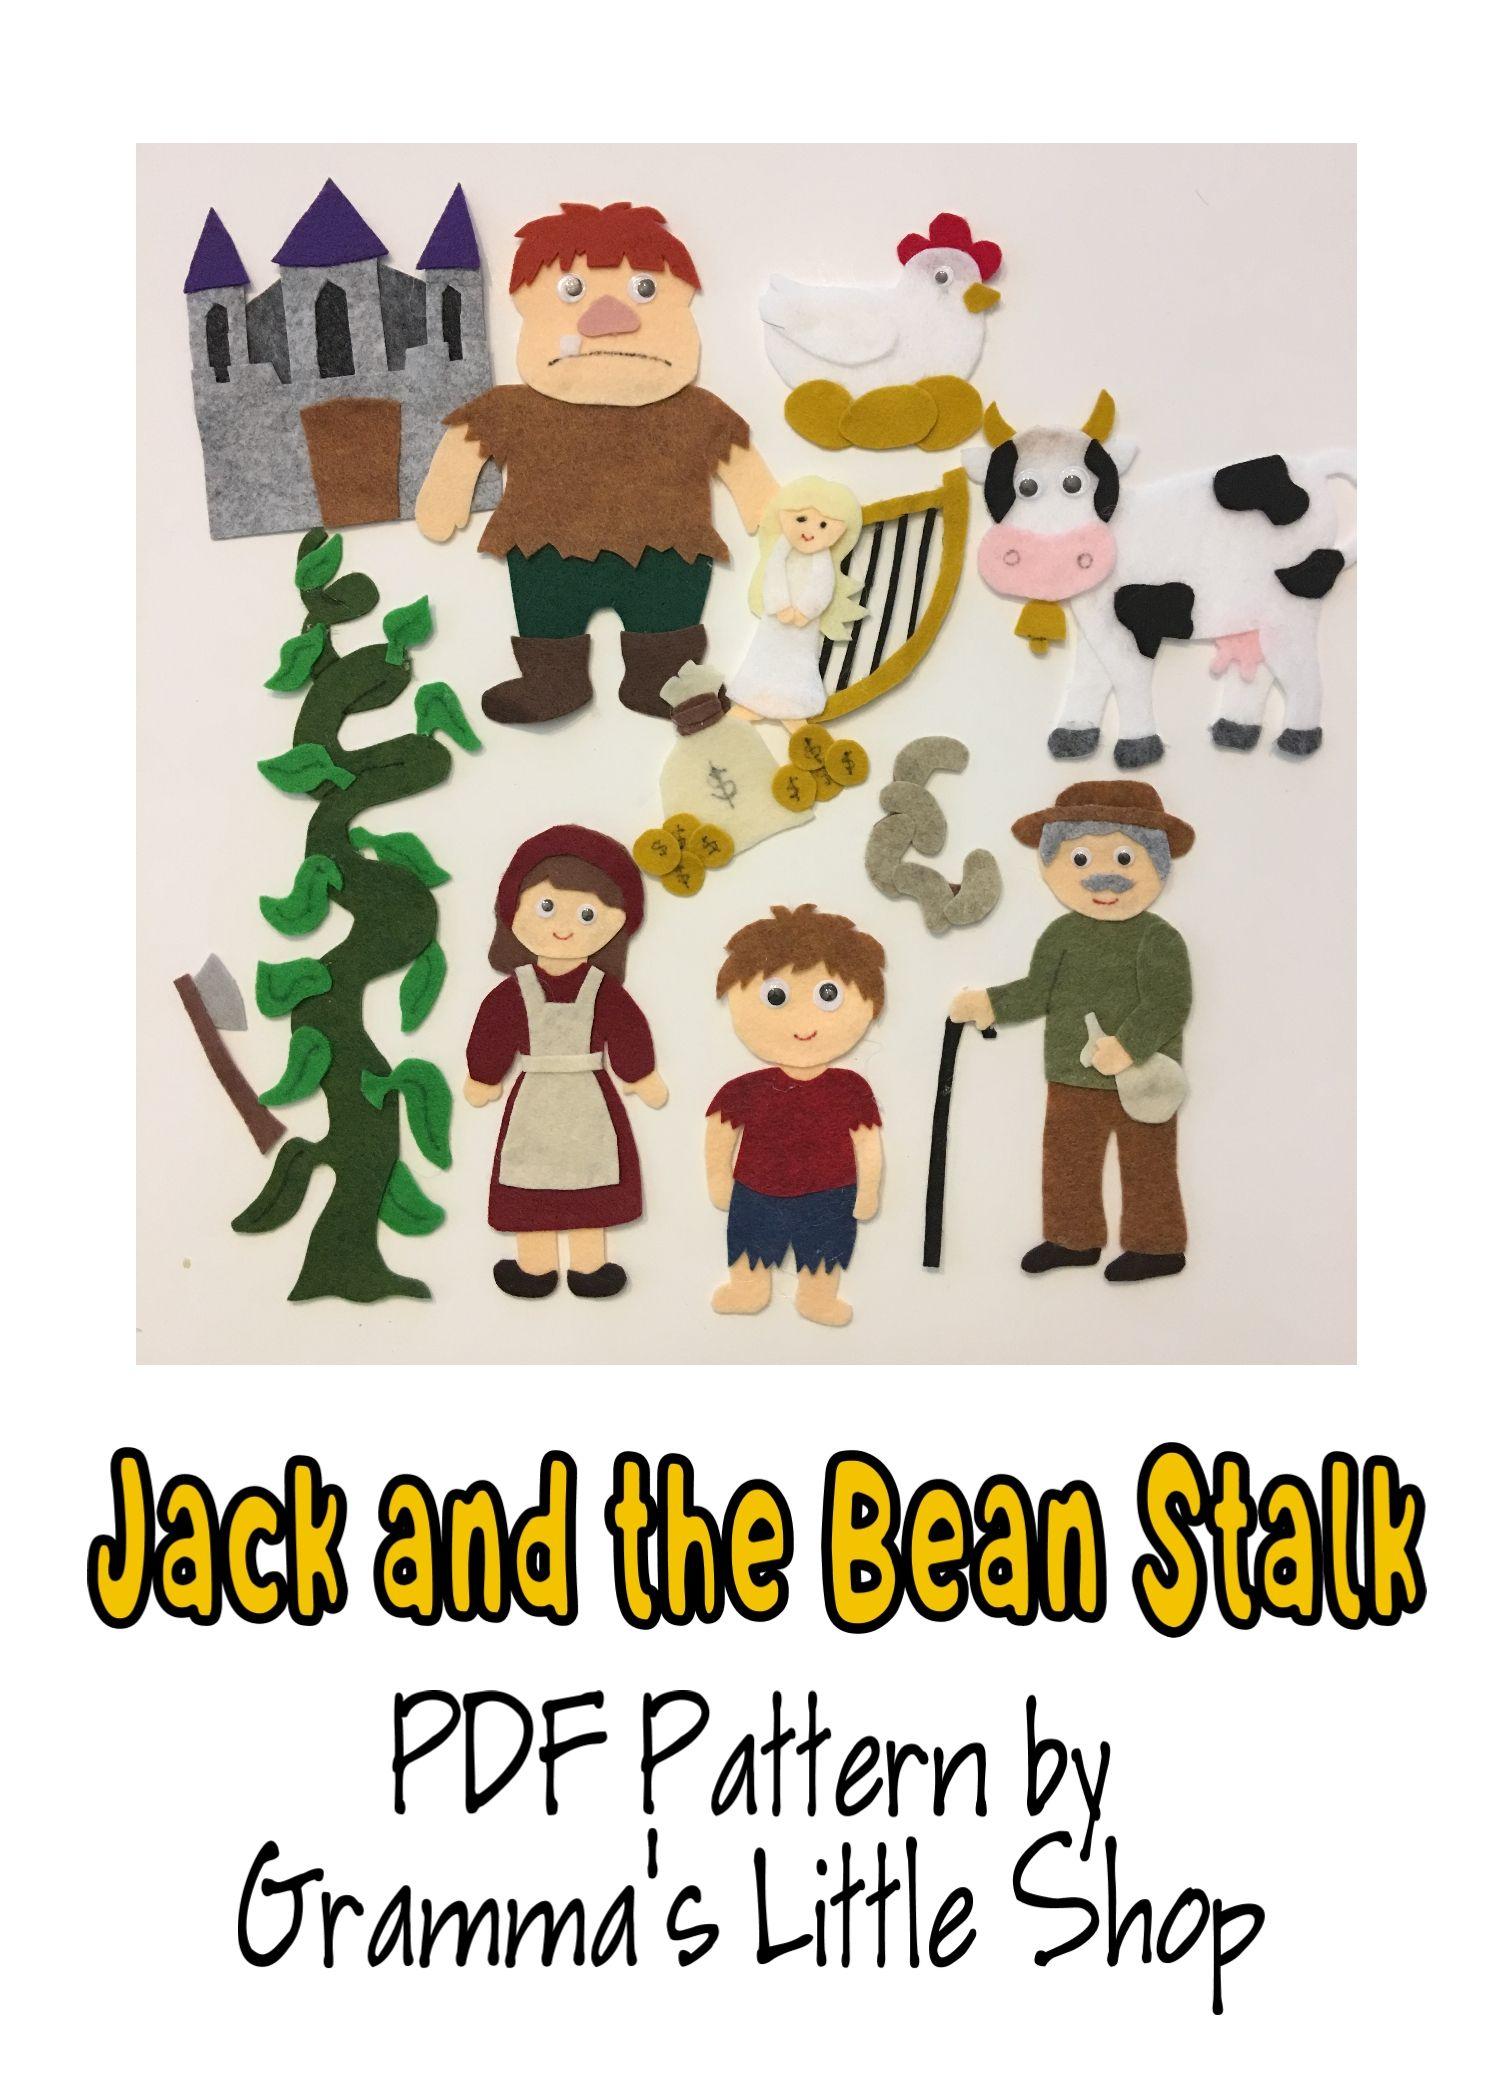 Jack And The Beanstalk Felt Story Pattern Teaching In The Home Felt Stories Jack And The Beanstalk Felt Board Stories